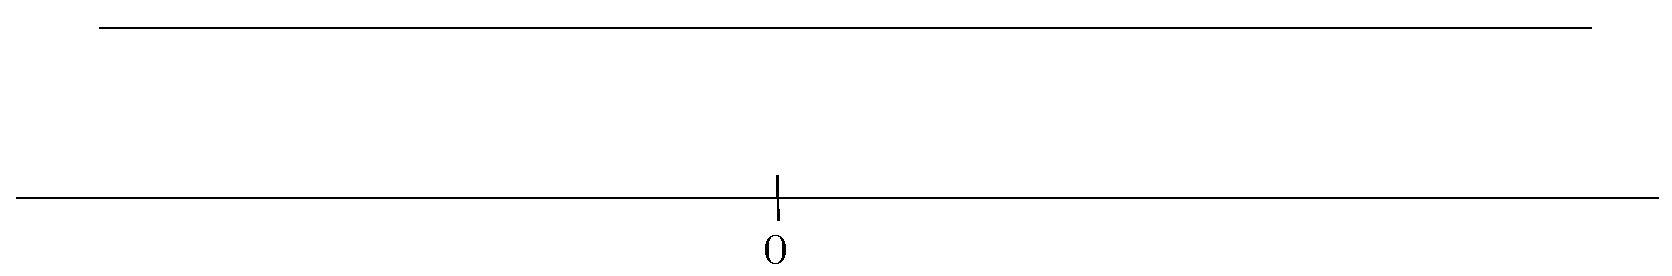 ch3.2.6.jpg